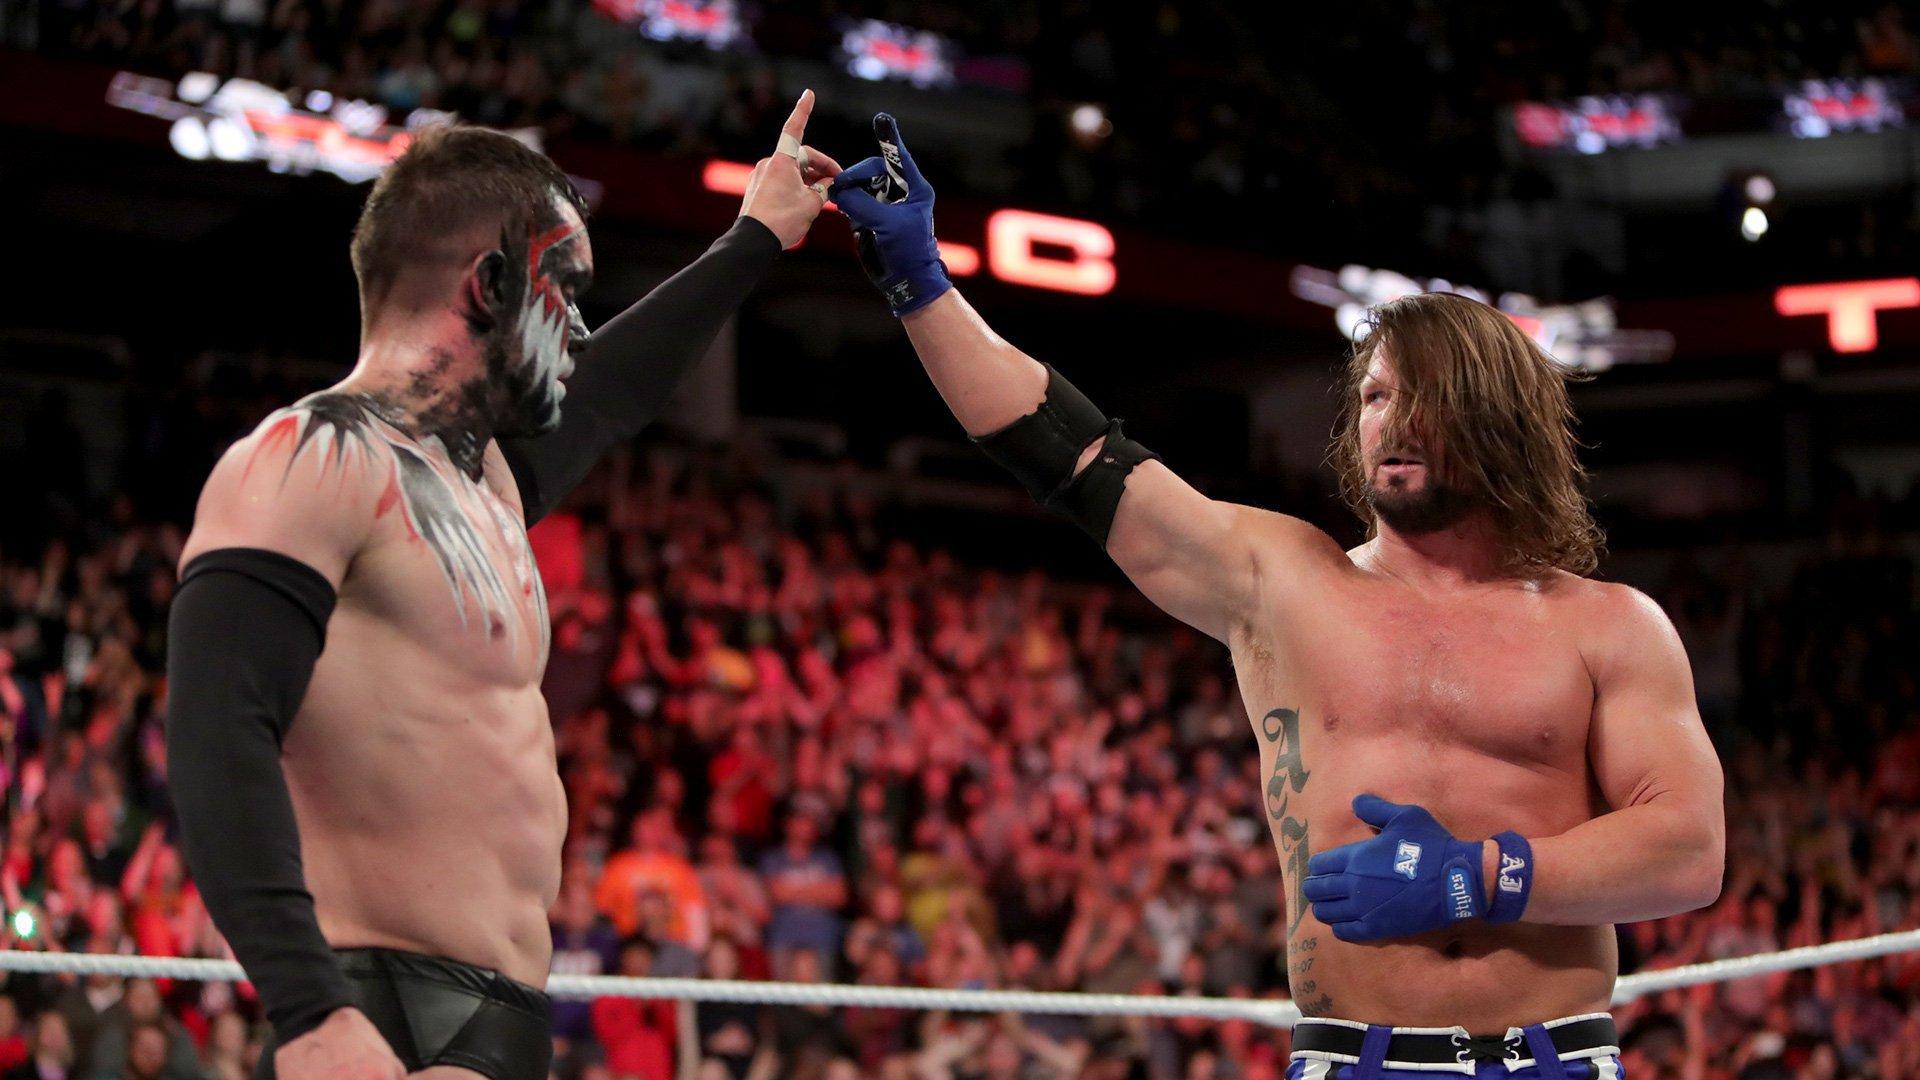 WWE TLC 2017 Review 10/22/2017